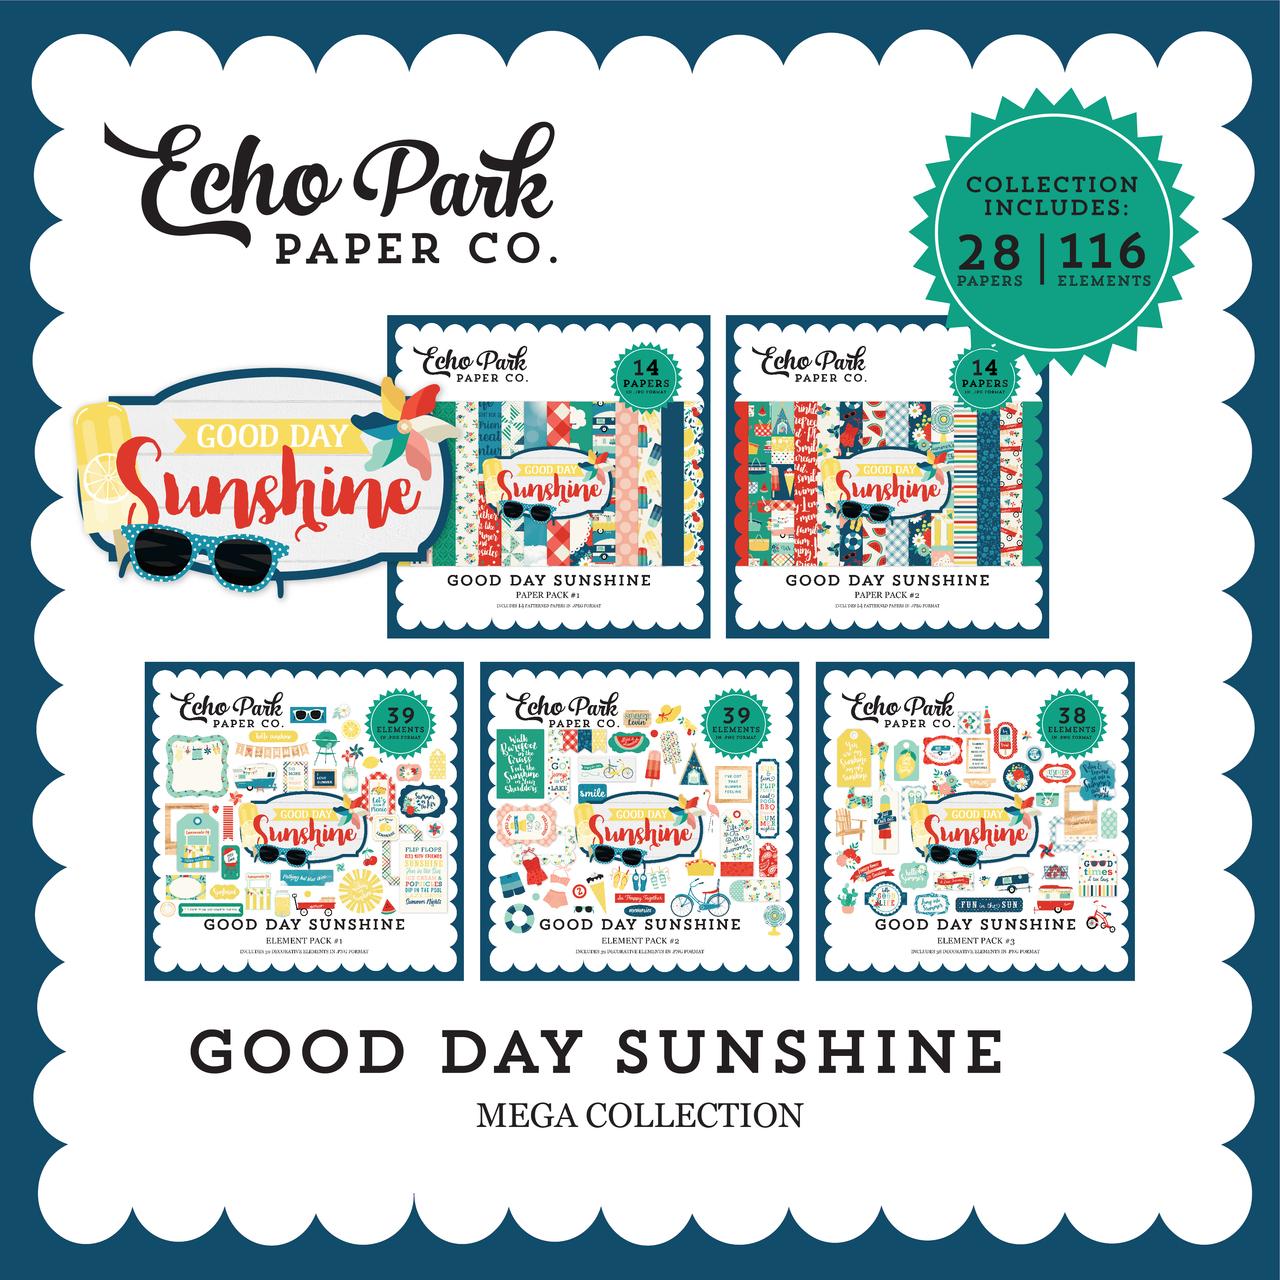 Good Day Sunshine Mega Collection